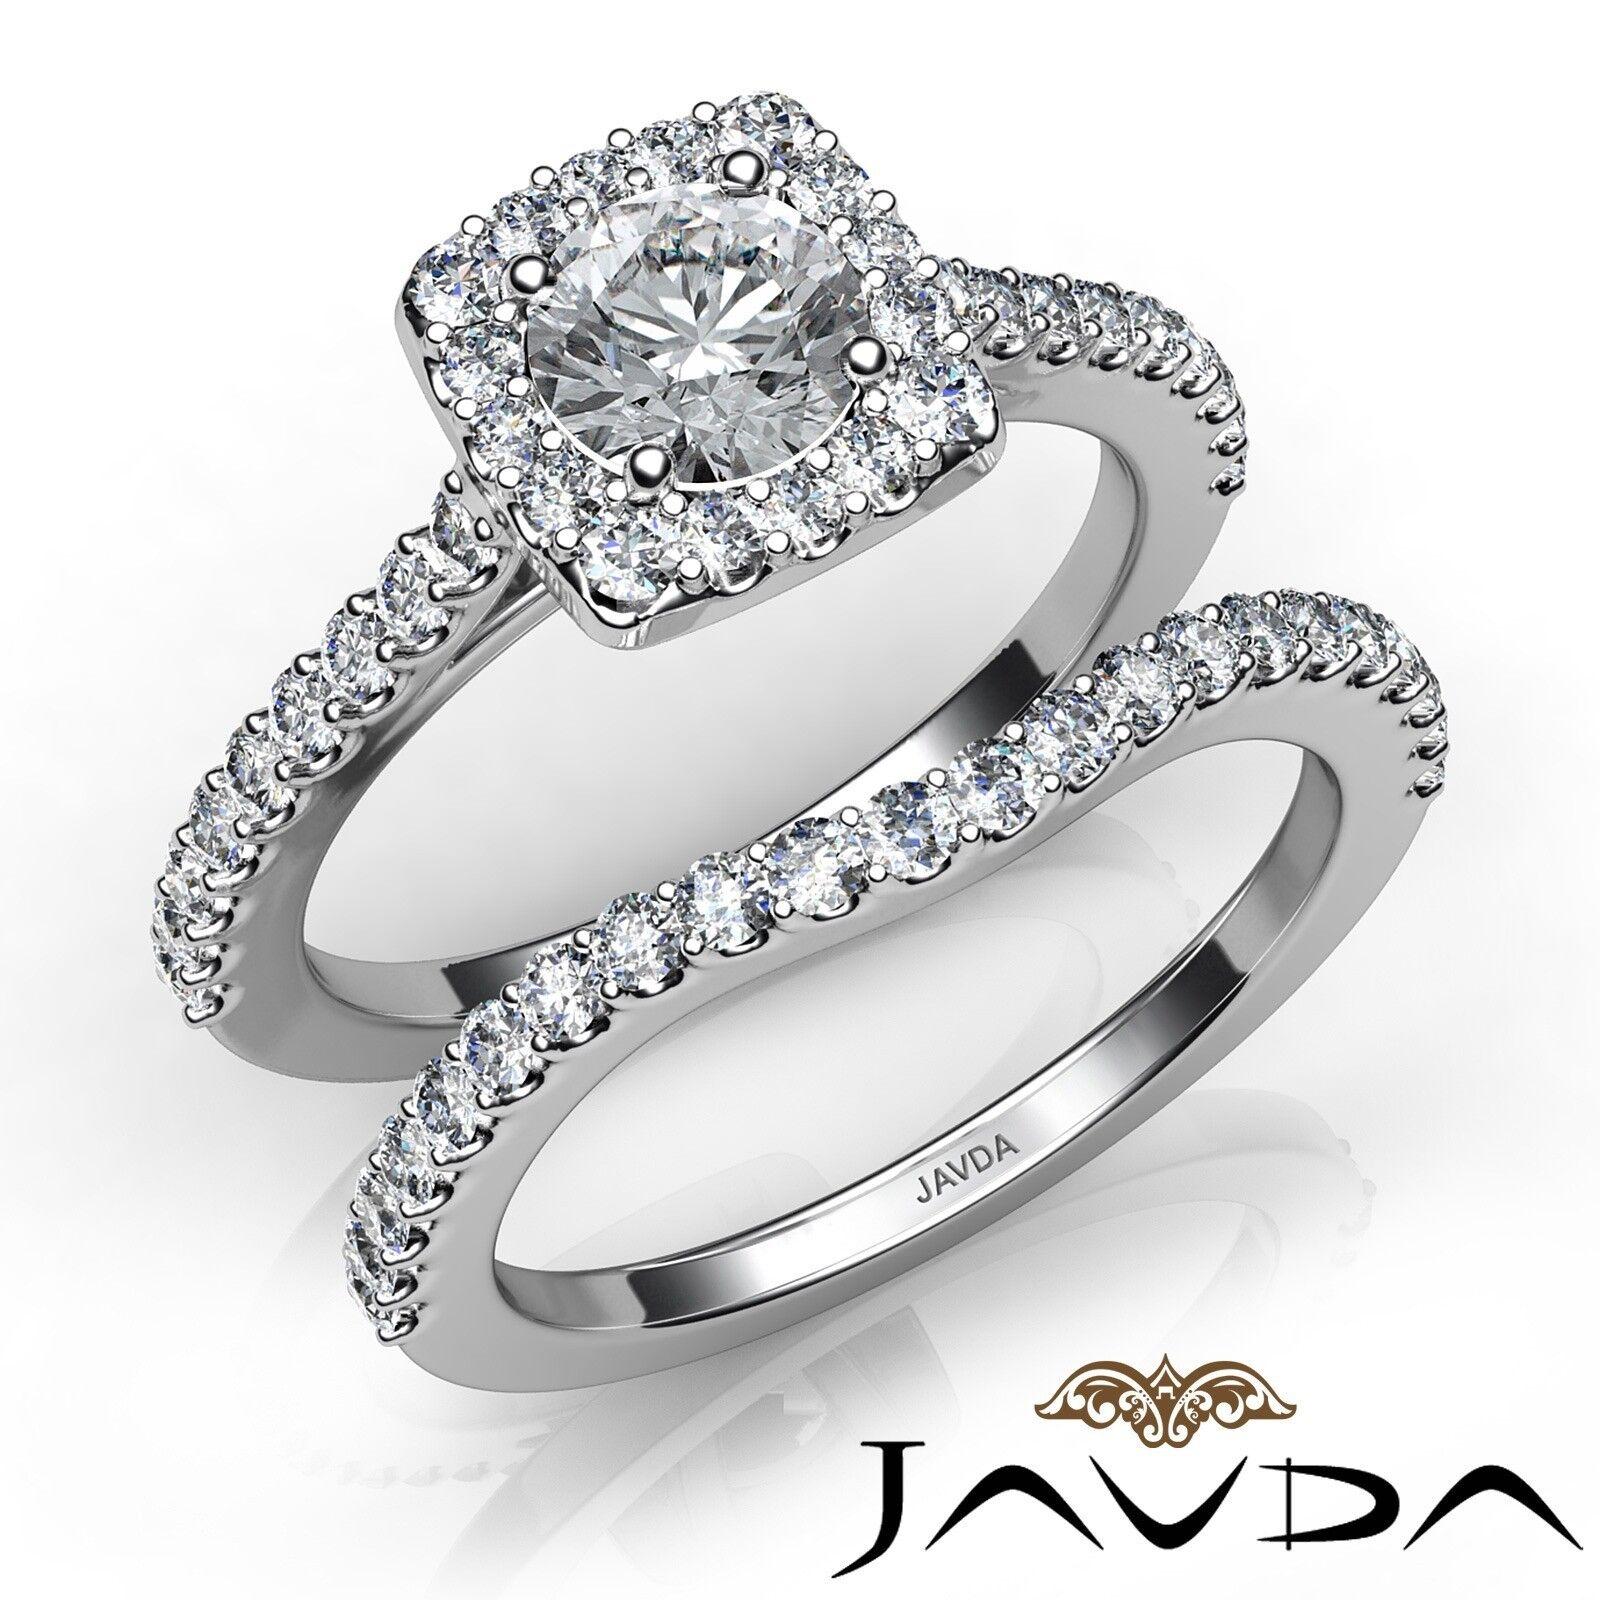 1.8ctw Halo U Prong Bridal Set Round Diamond Engagement Ring GIA E-VVS2 W Gold